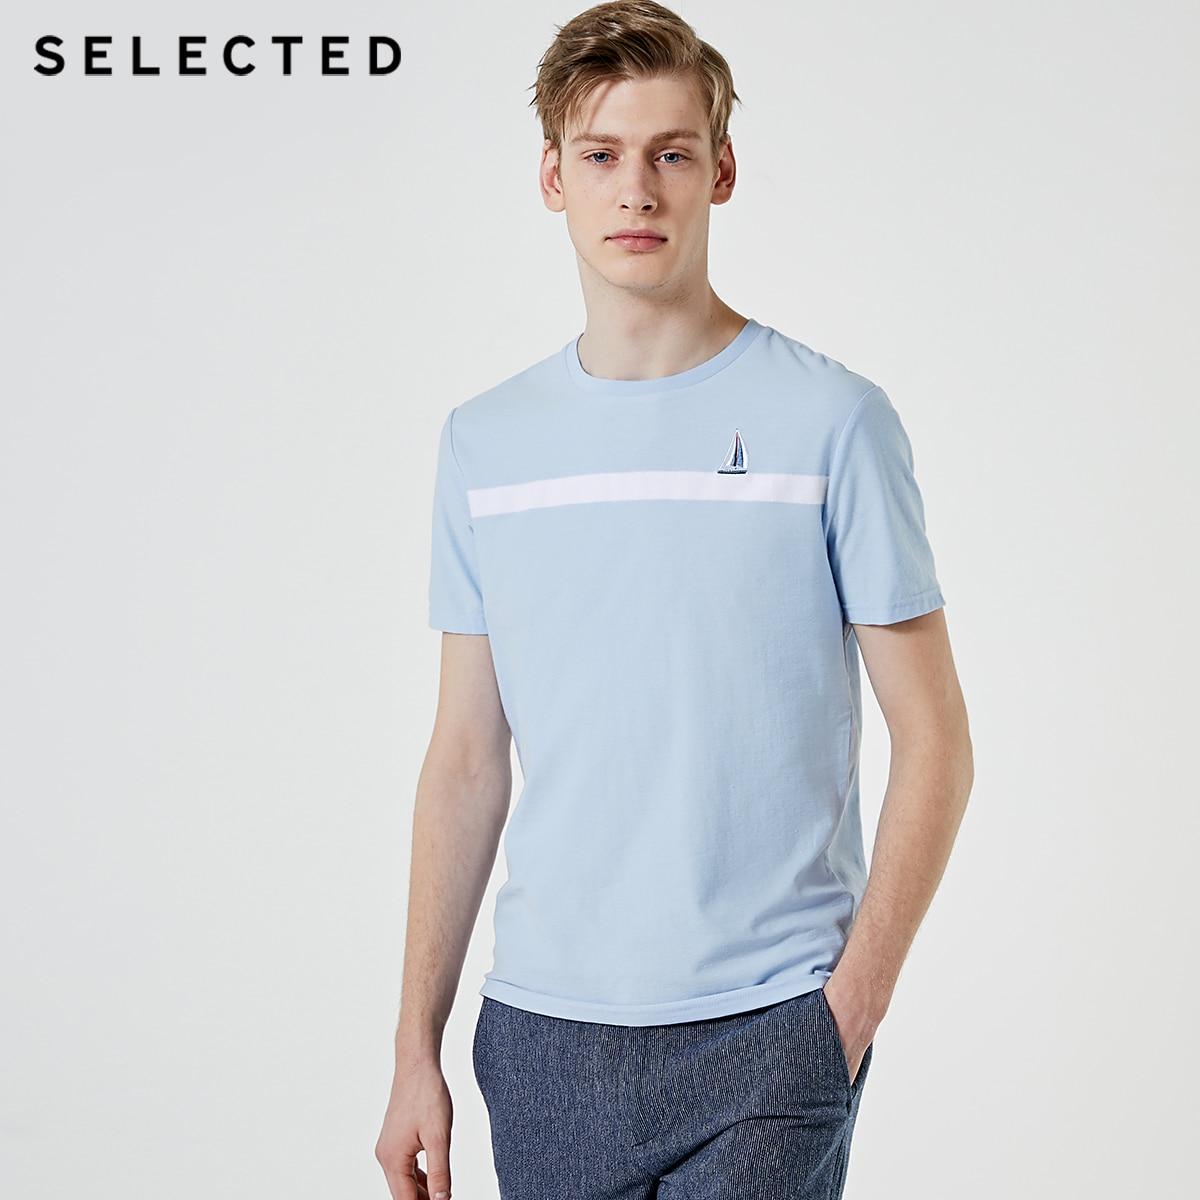 SELECTED Men's 100% Cotton Round Neckline Short-sleeved T-shirt S 419201563